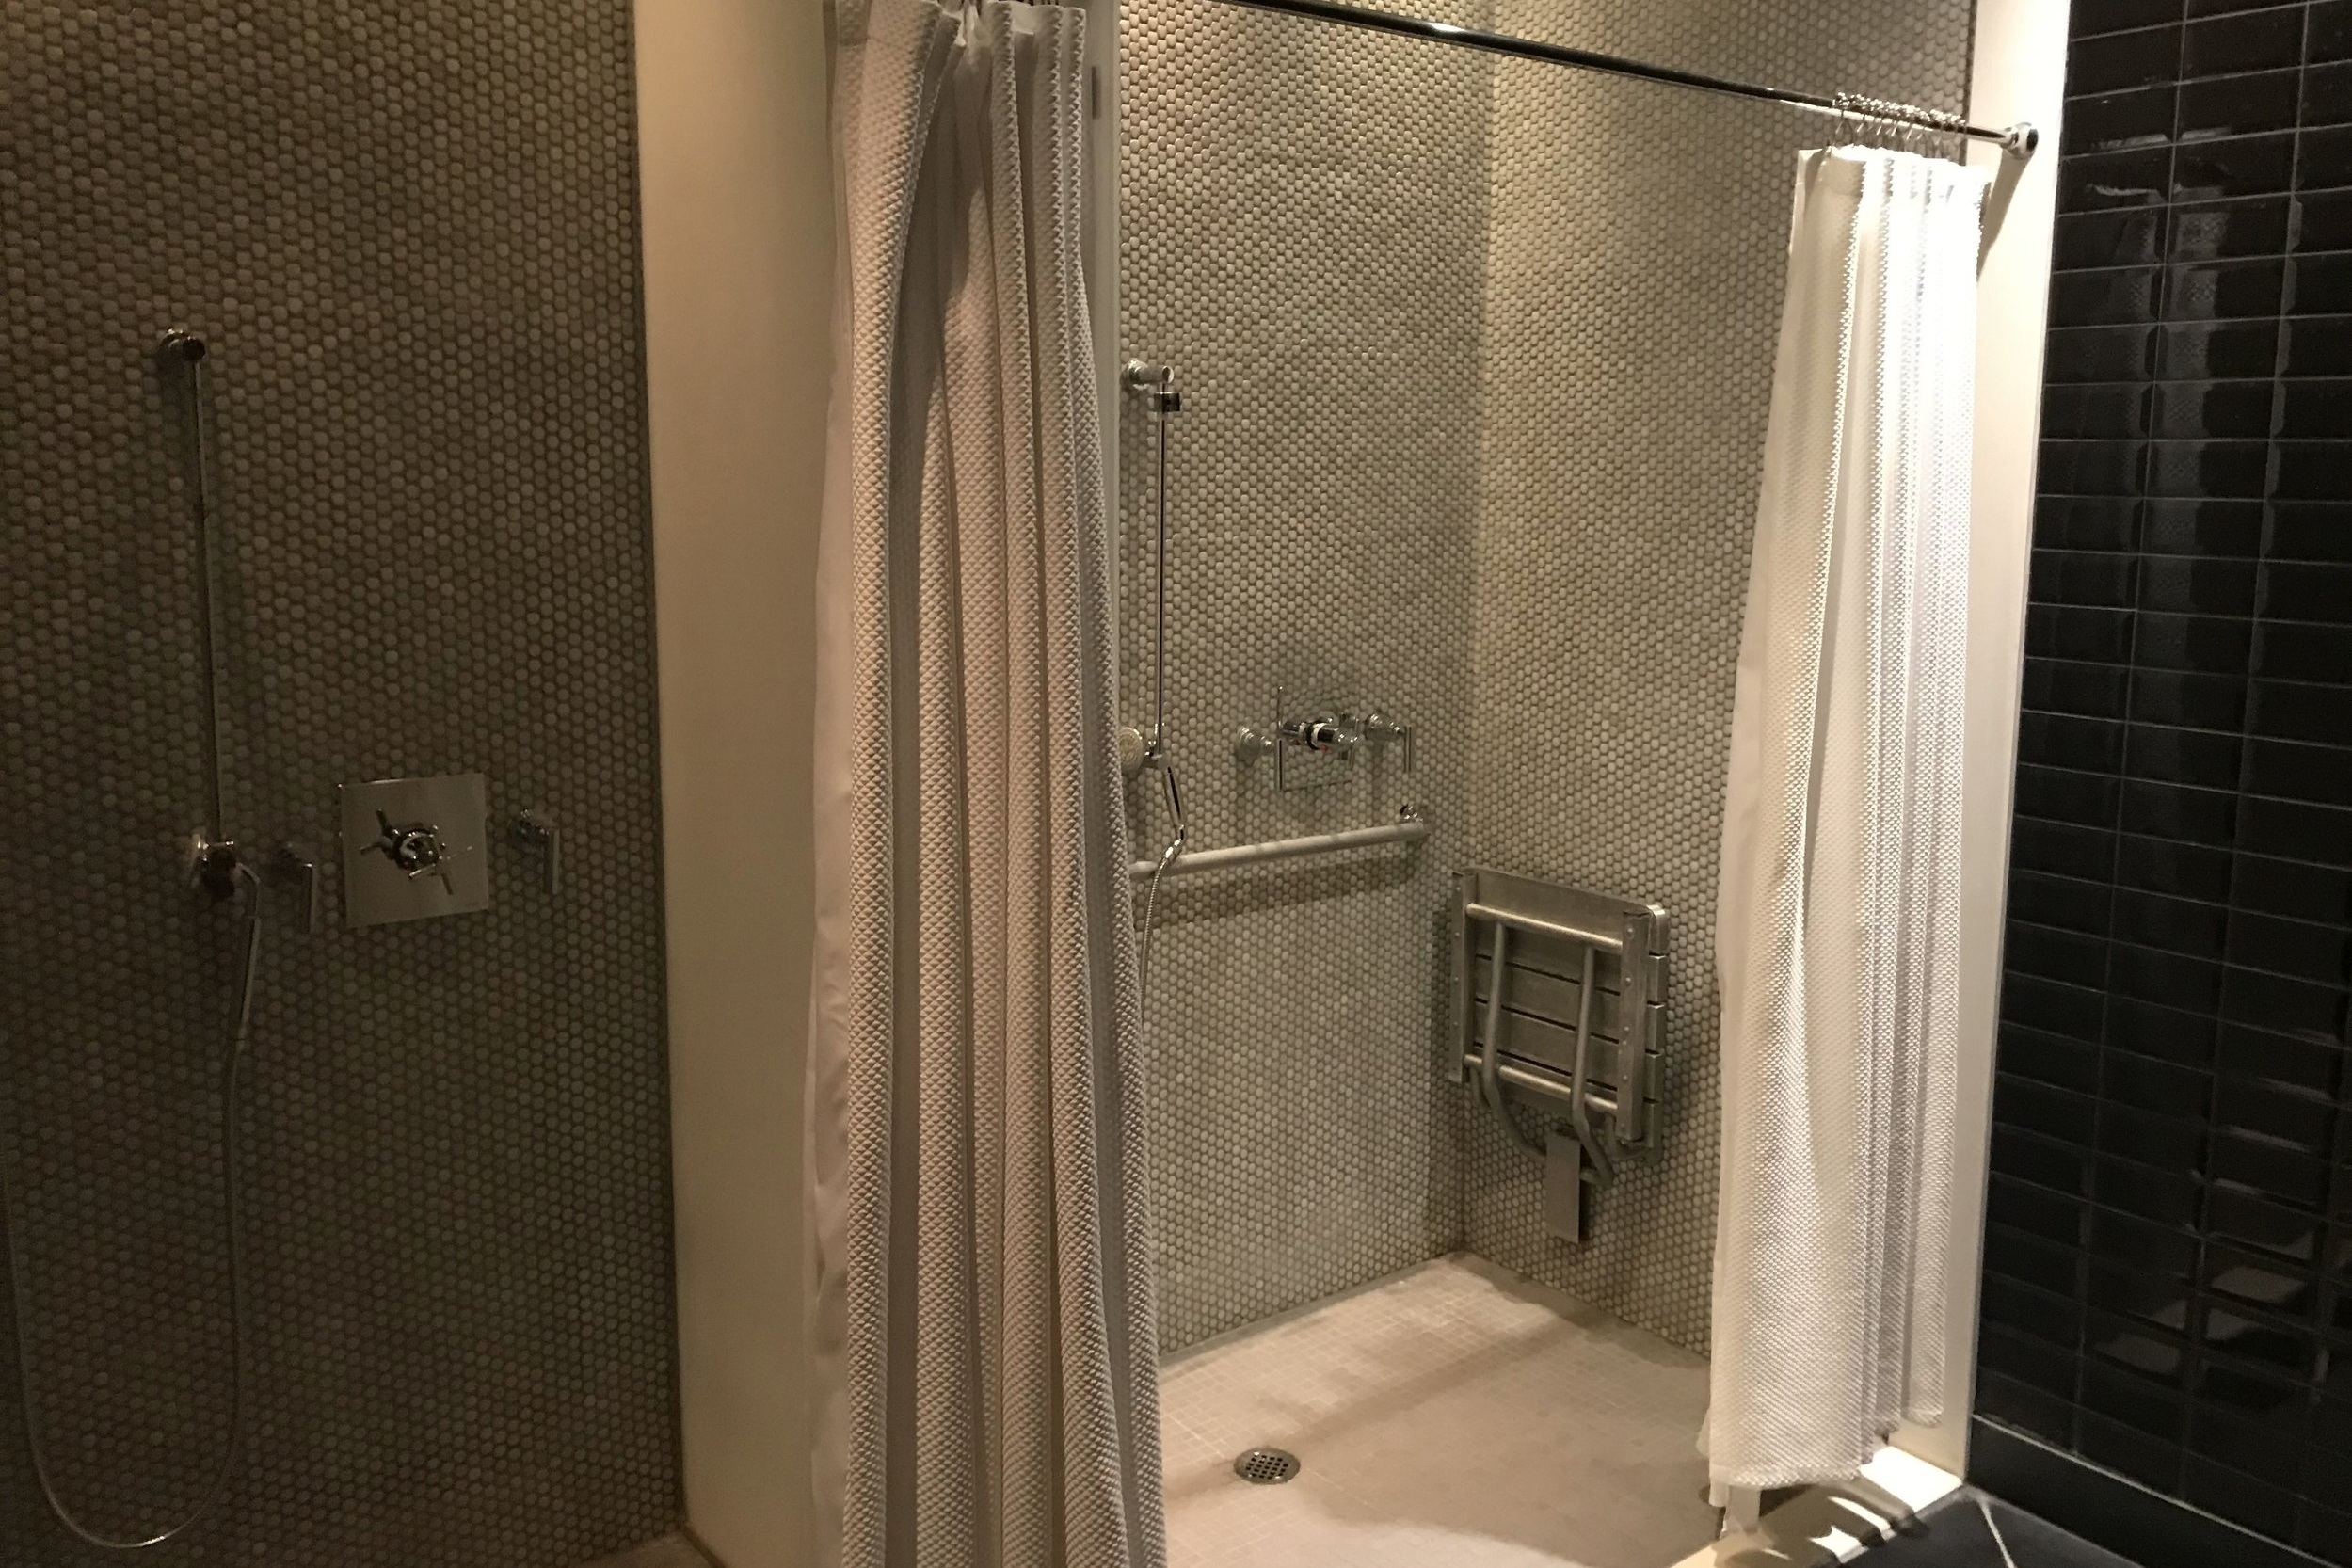 St. Regis Toronto – Changing room showers